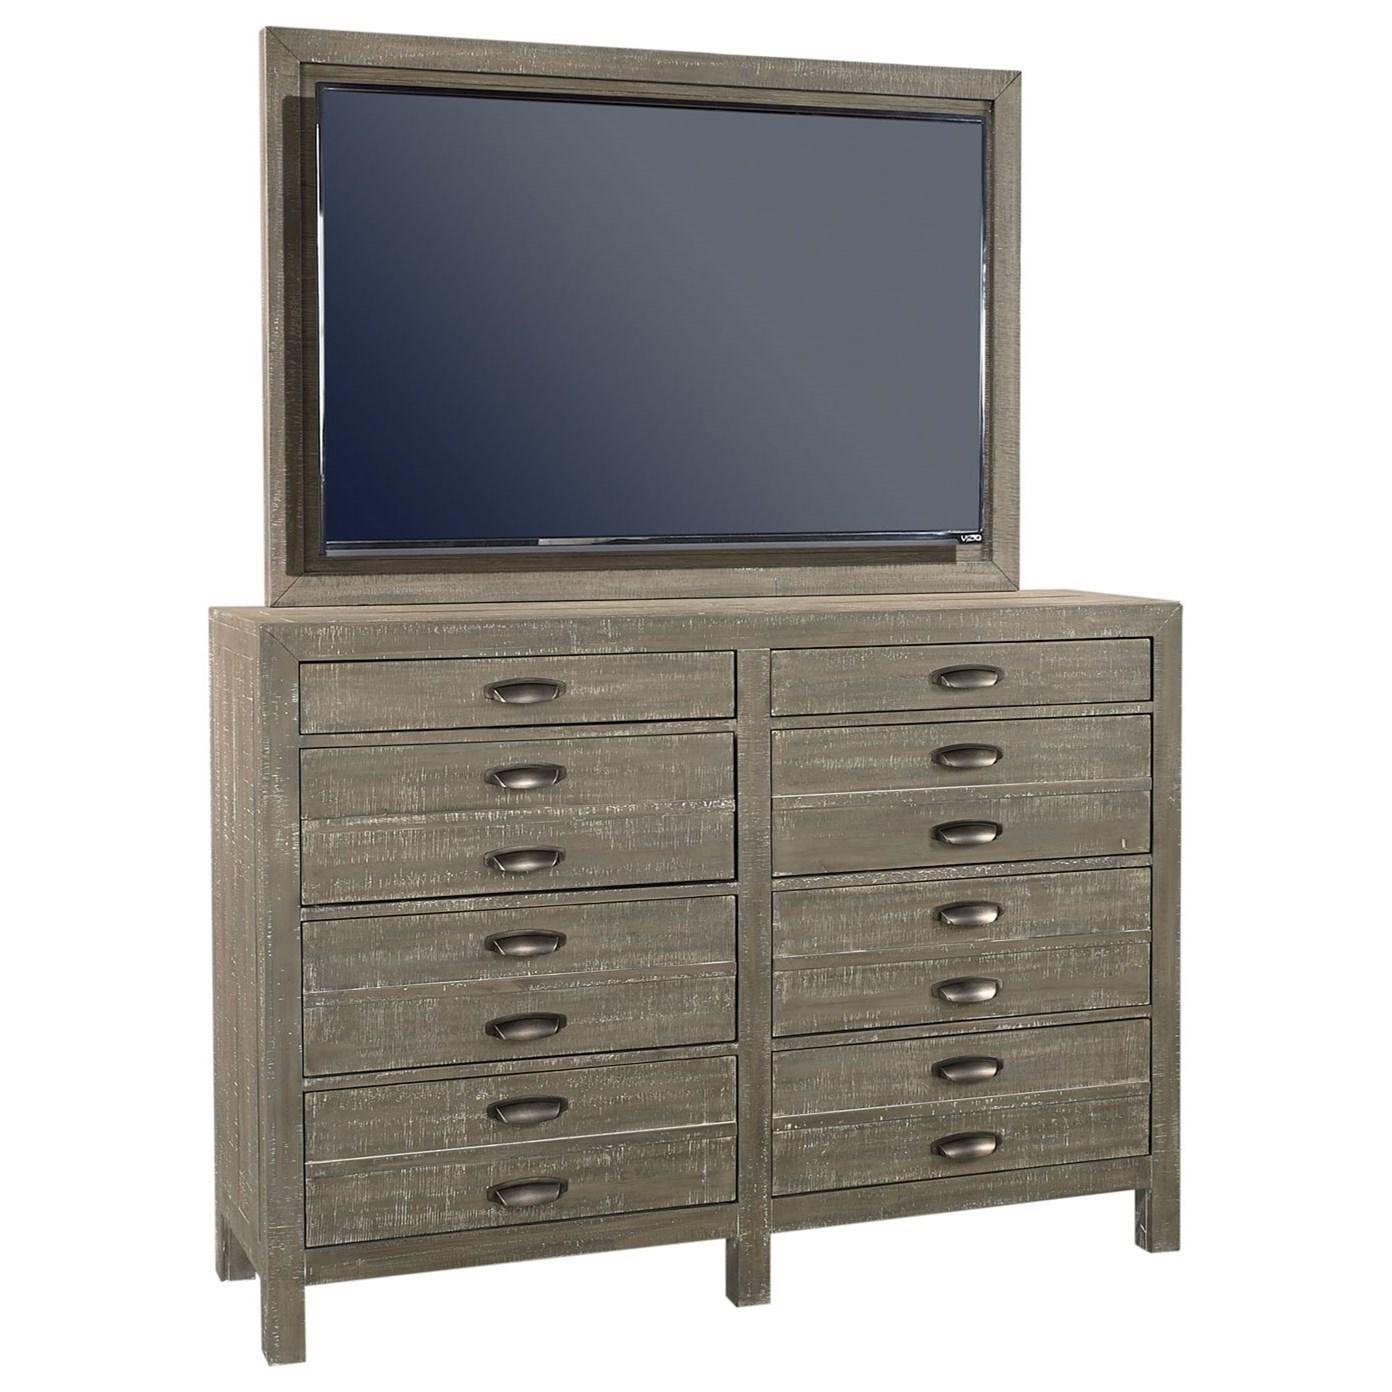 Tv Bedroom Furniture: Aspenhome Radiata 8 Drawer Chesser With TV Mount